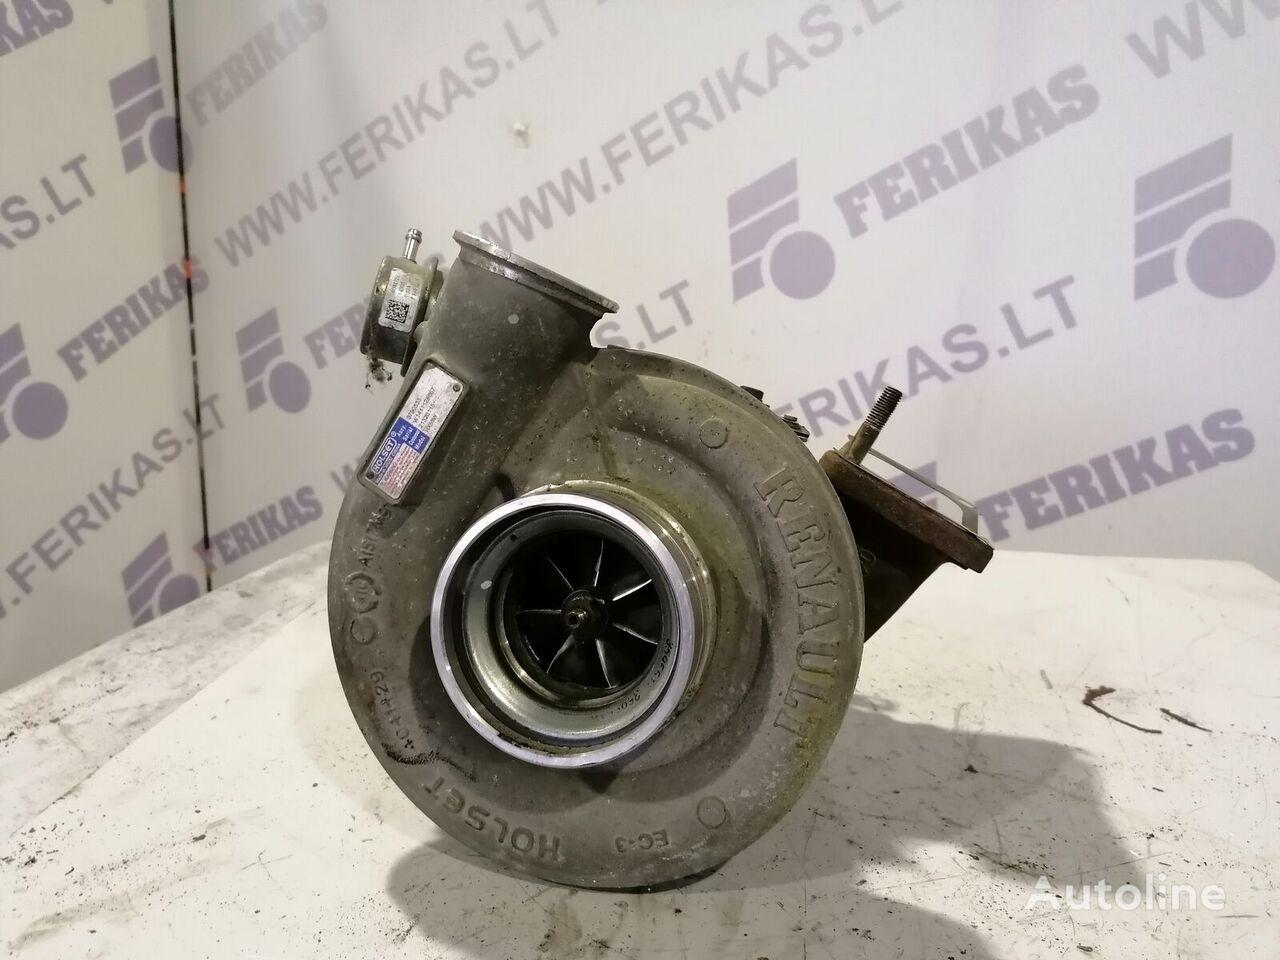 HOLSET (21326115 3790533) engine turbocharger for tractor unit